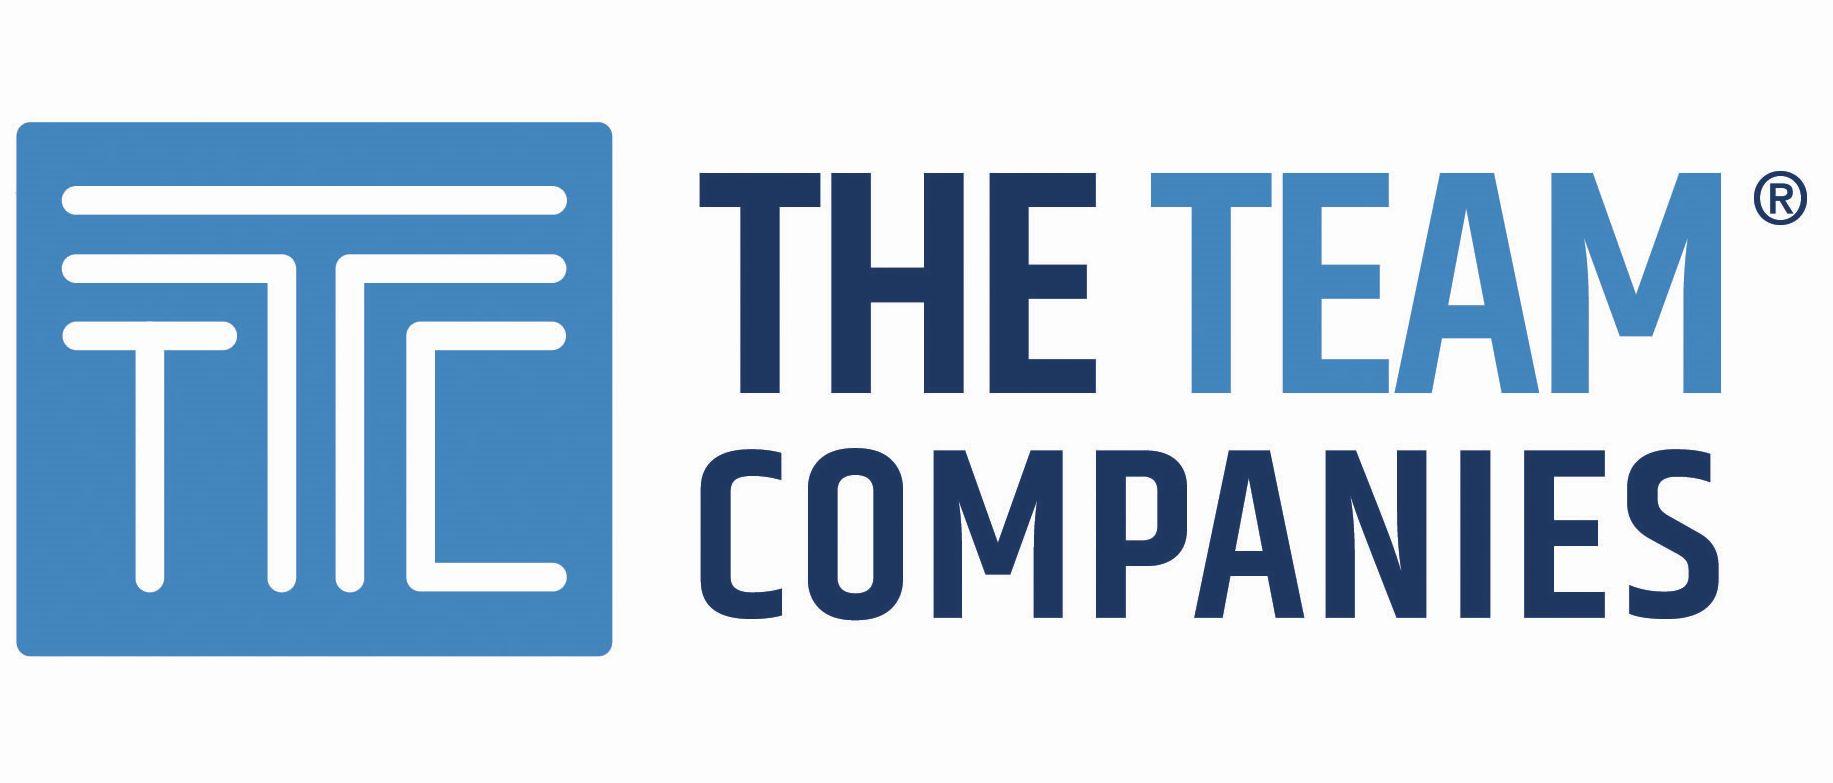 Team Companies